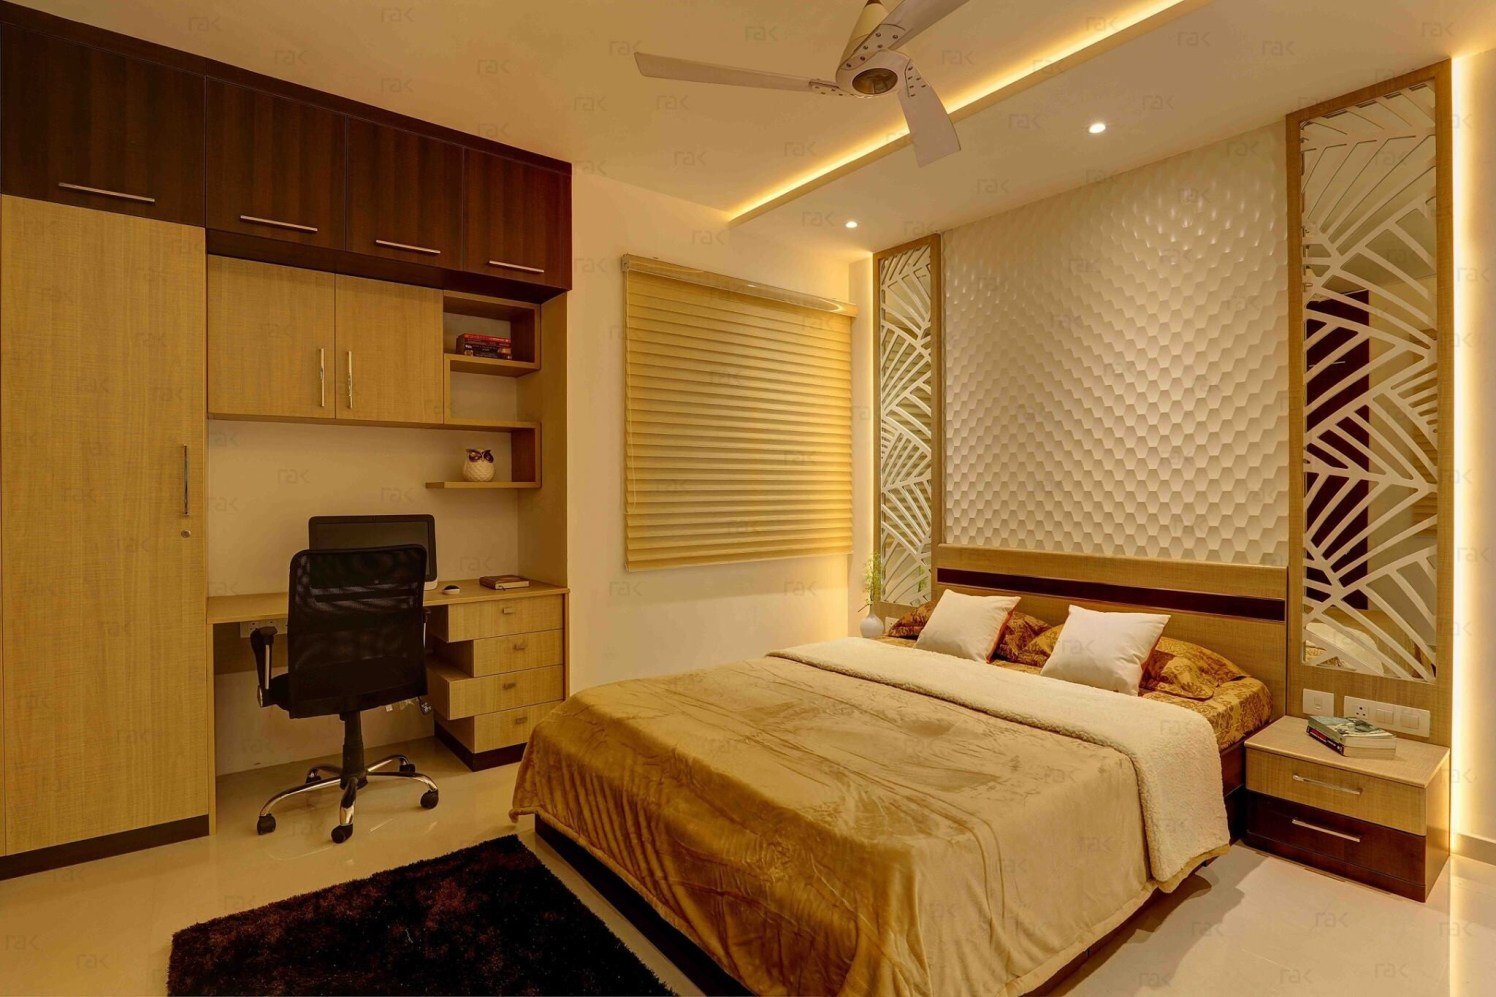 Meticulous Bedroom by Right Choice Enterprises Contemporary | Interior Design Photos & Ideas